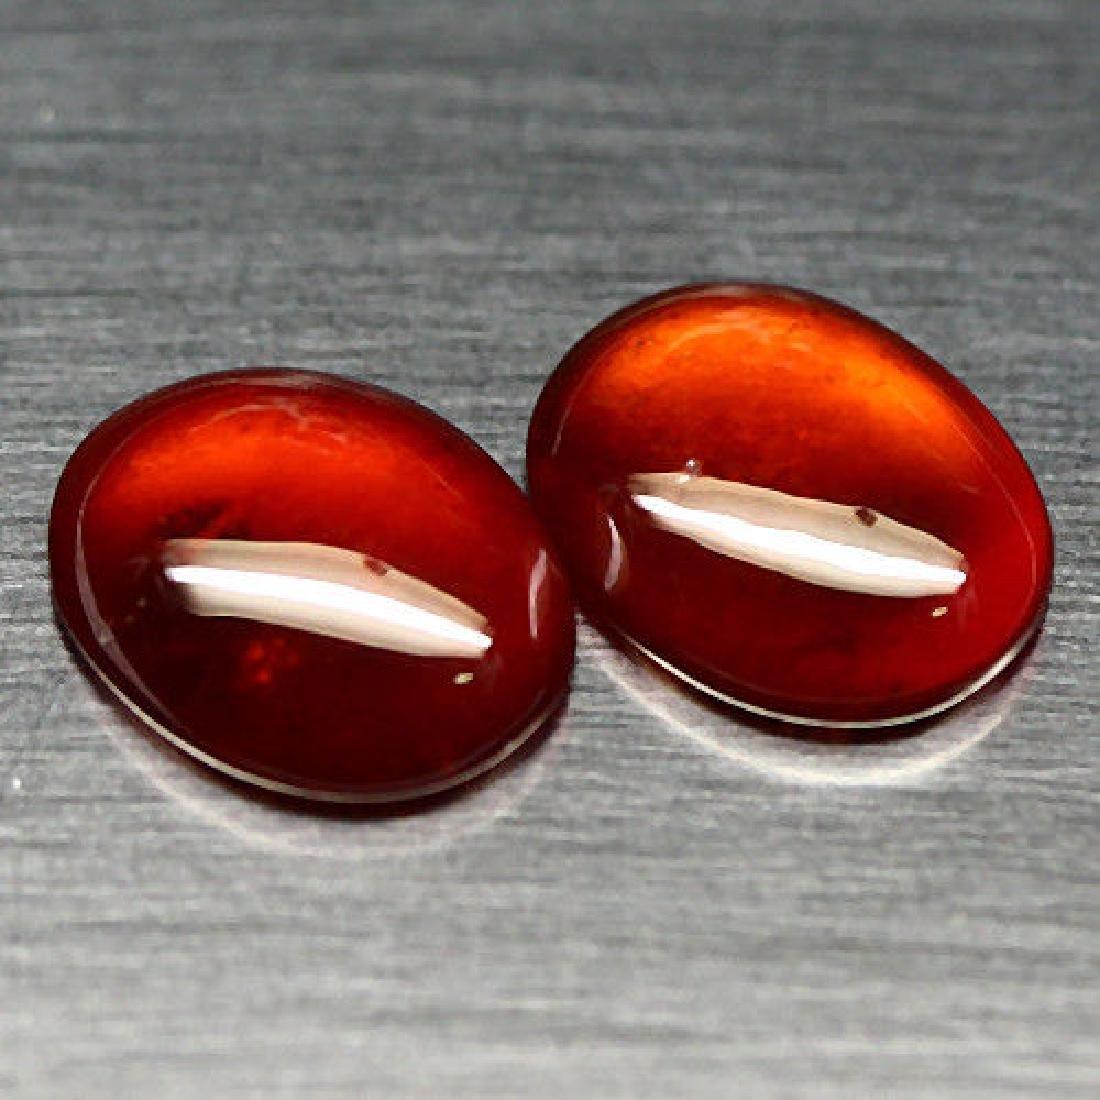 6.78 Ct Natural! Pair! Orange Hessonite Garnet Oval - 2